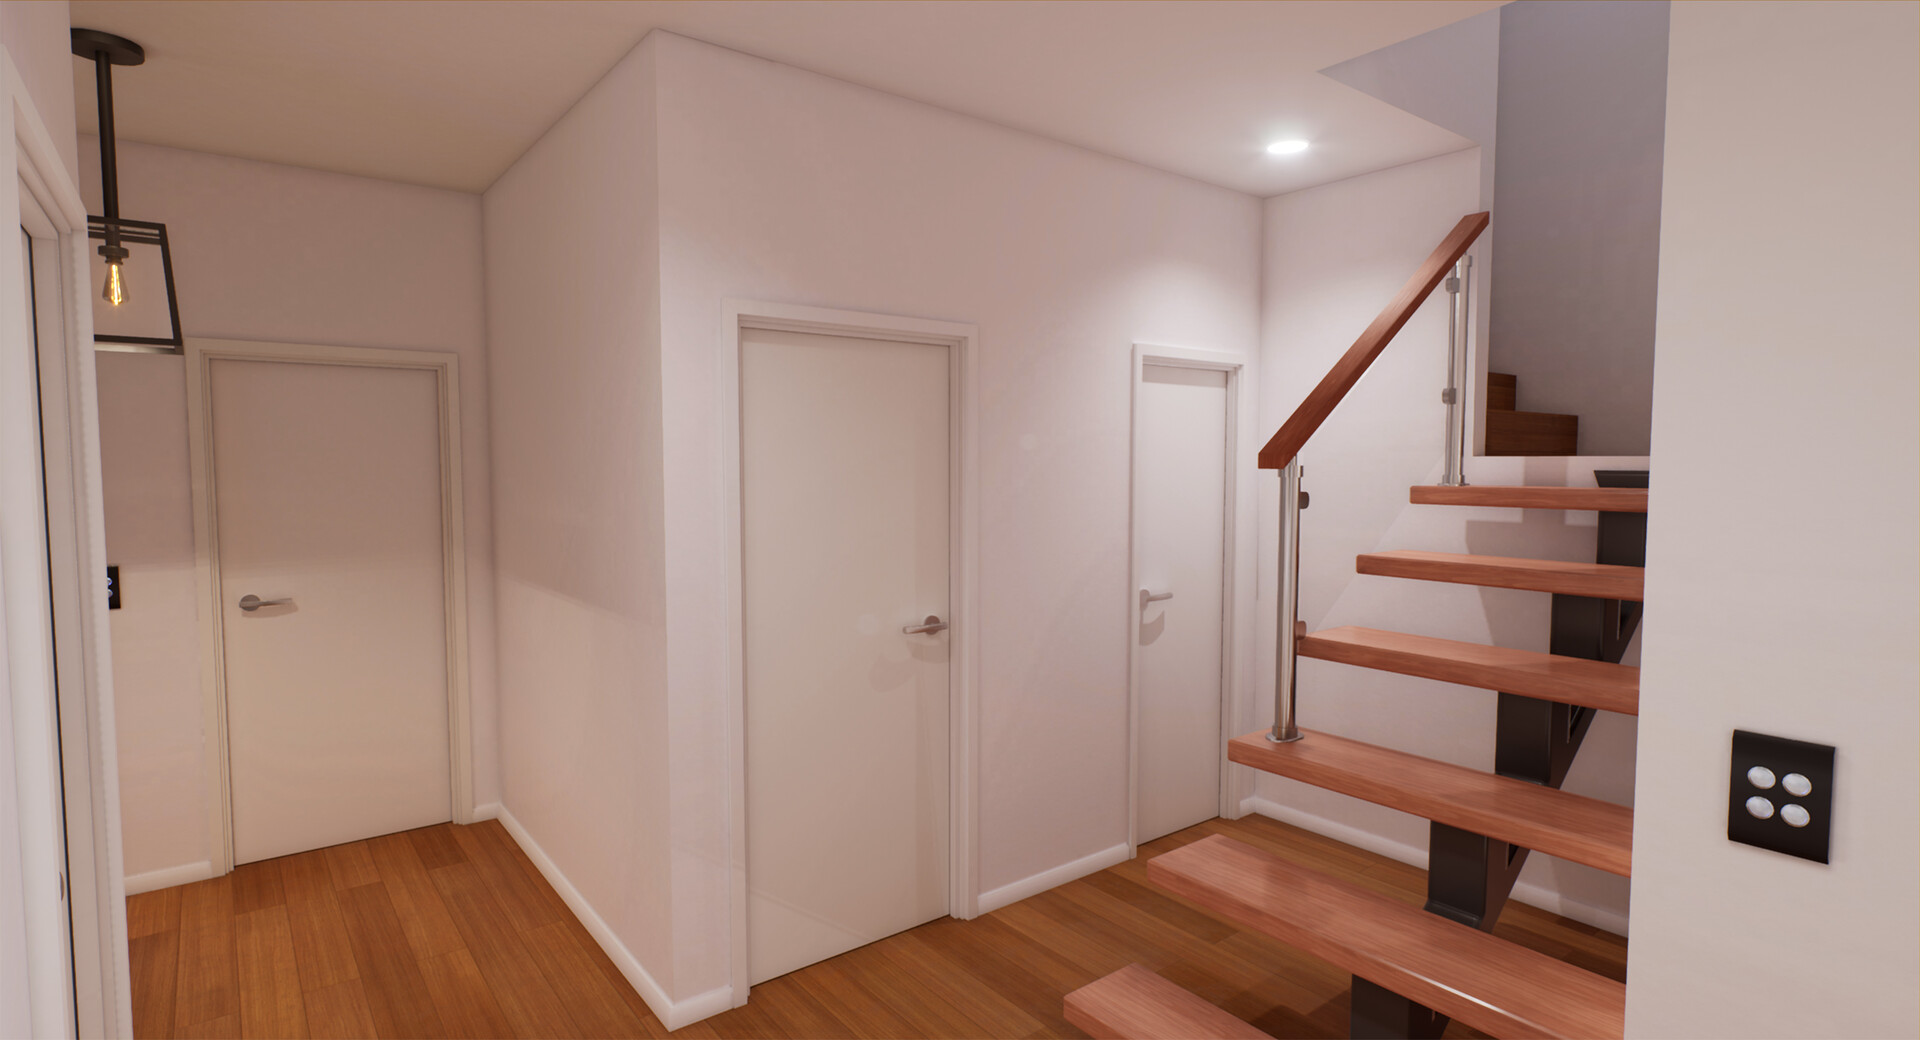 Jordan younie stairs